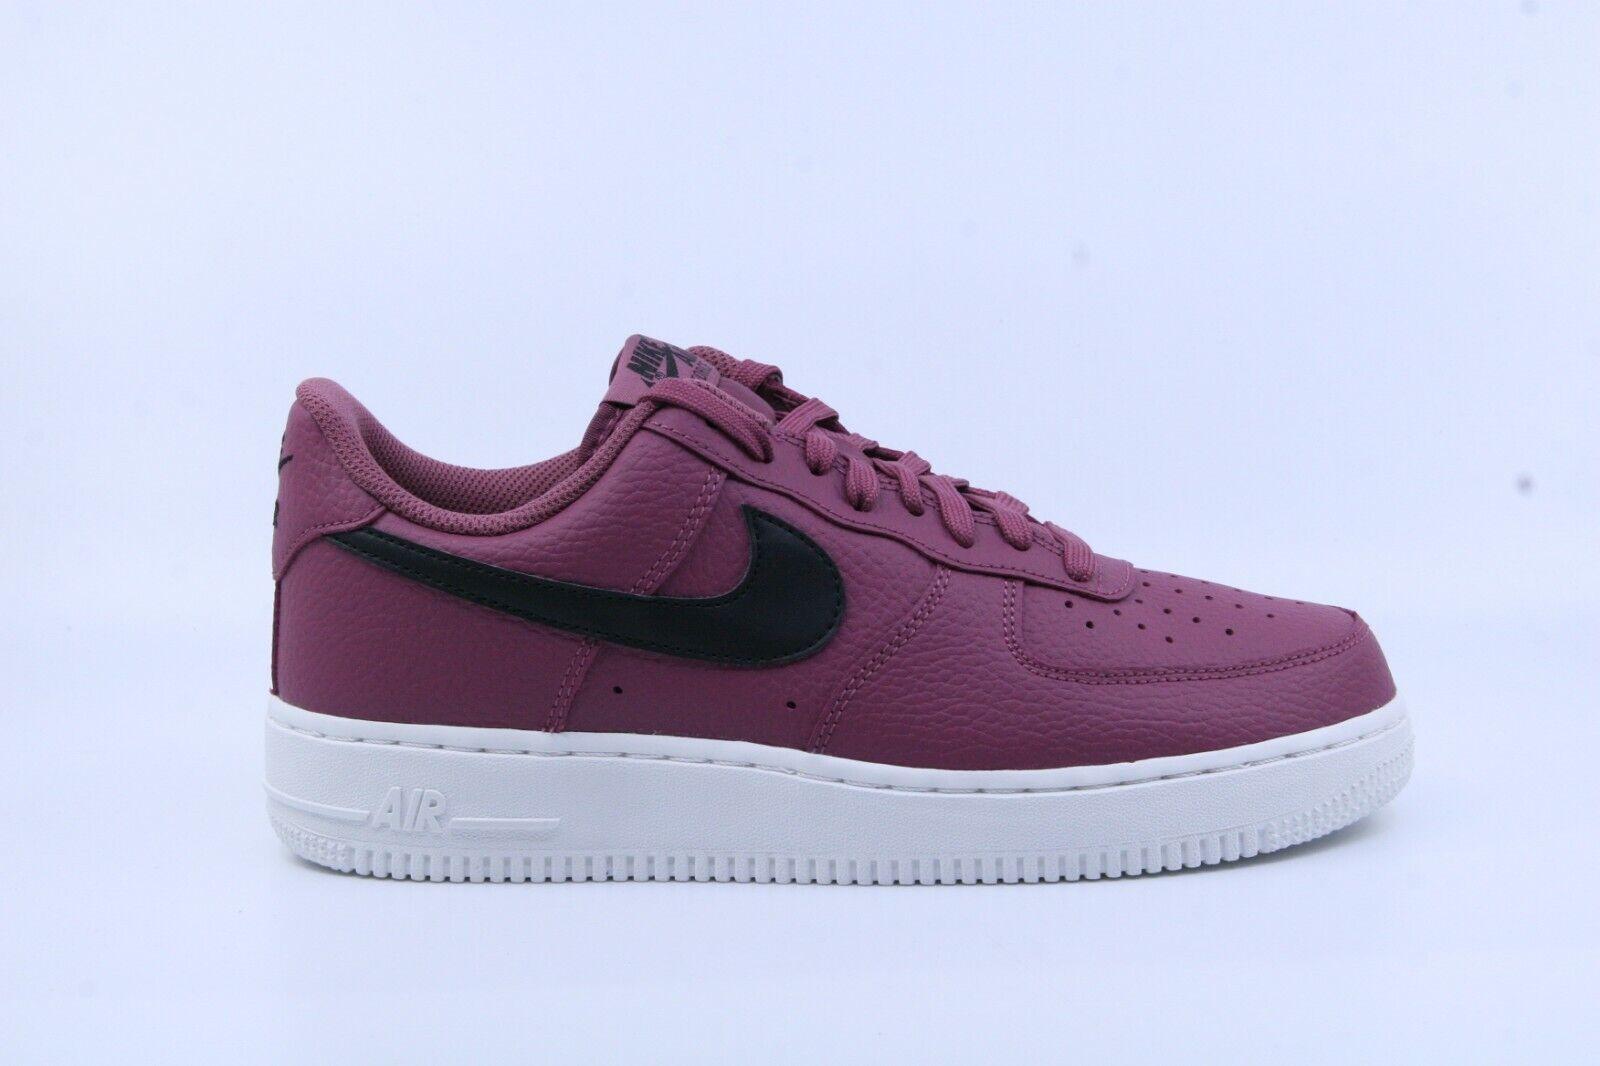 Nike Men's  Air Force 1'07 viola US8.5 AA4083 -601  grandi offerte